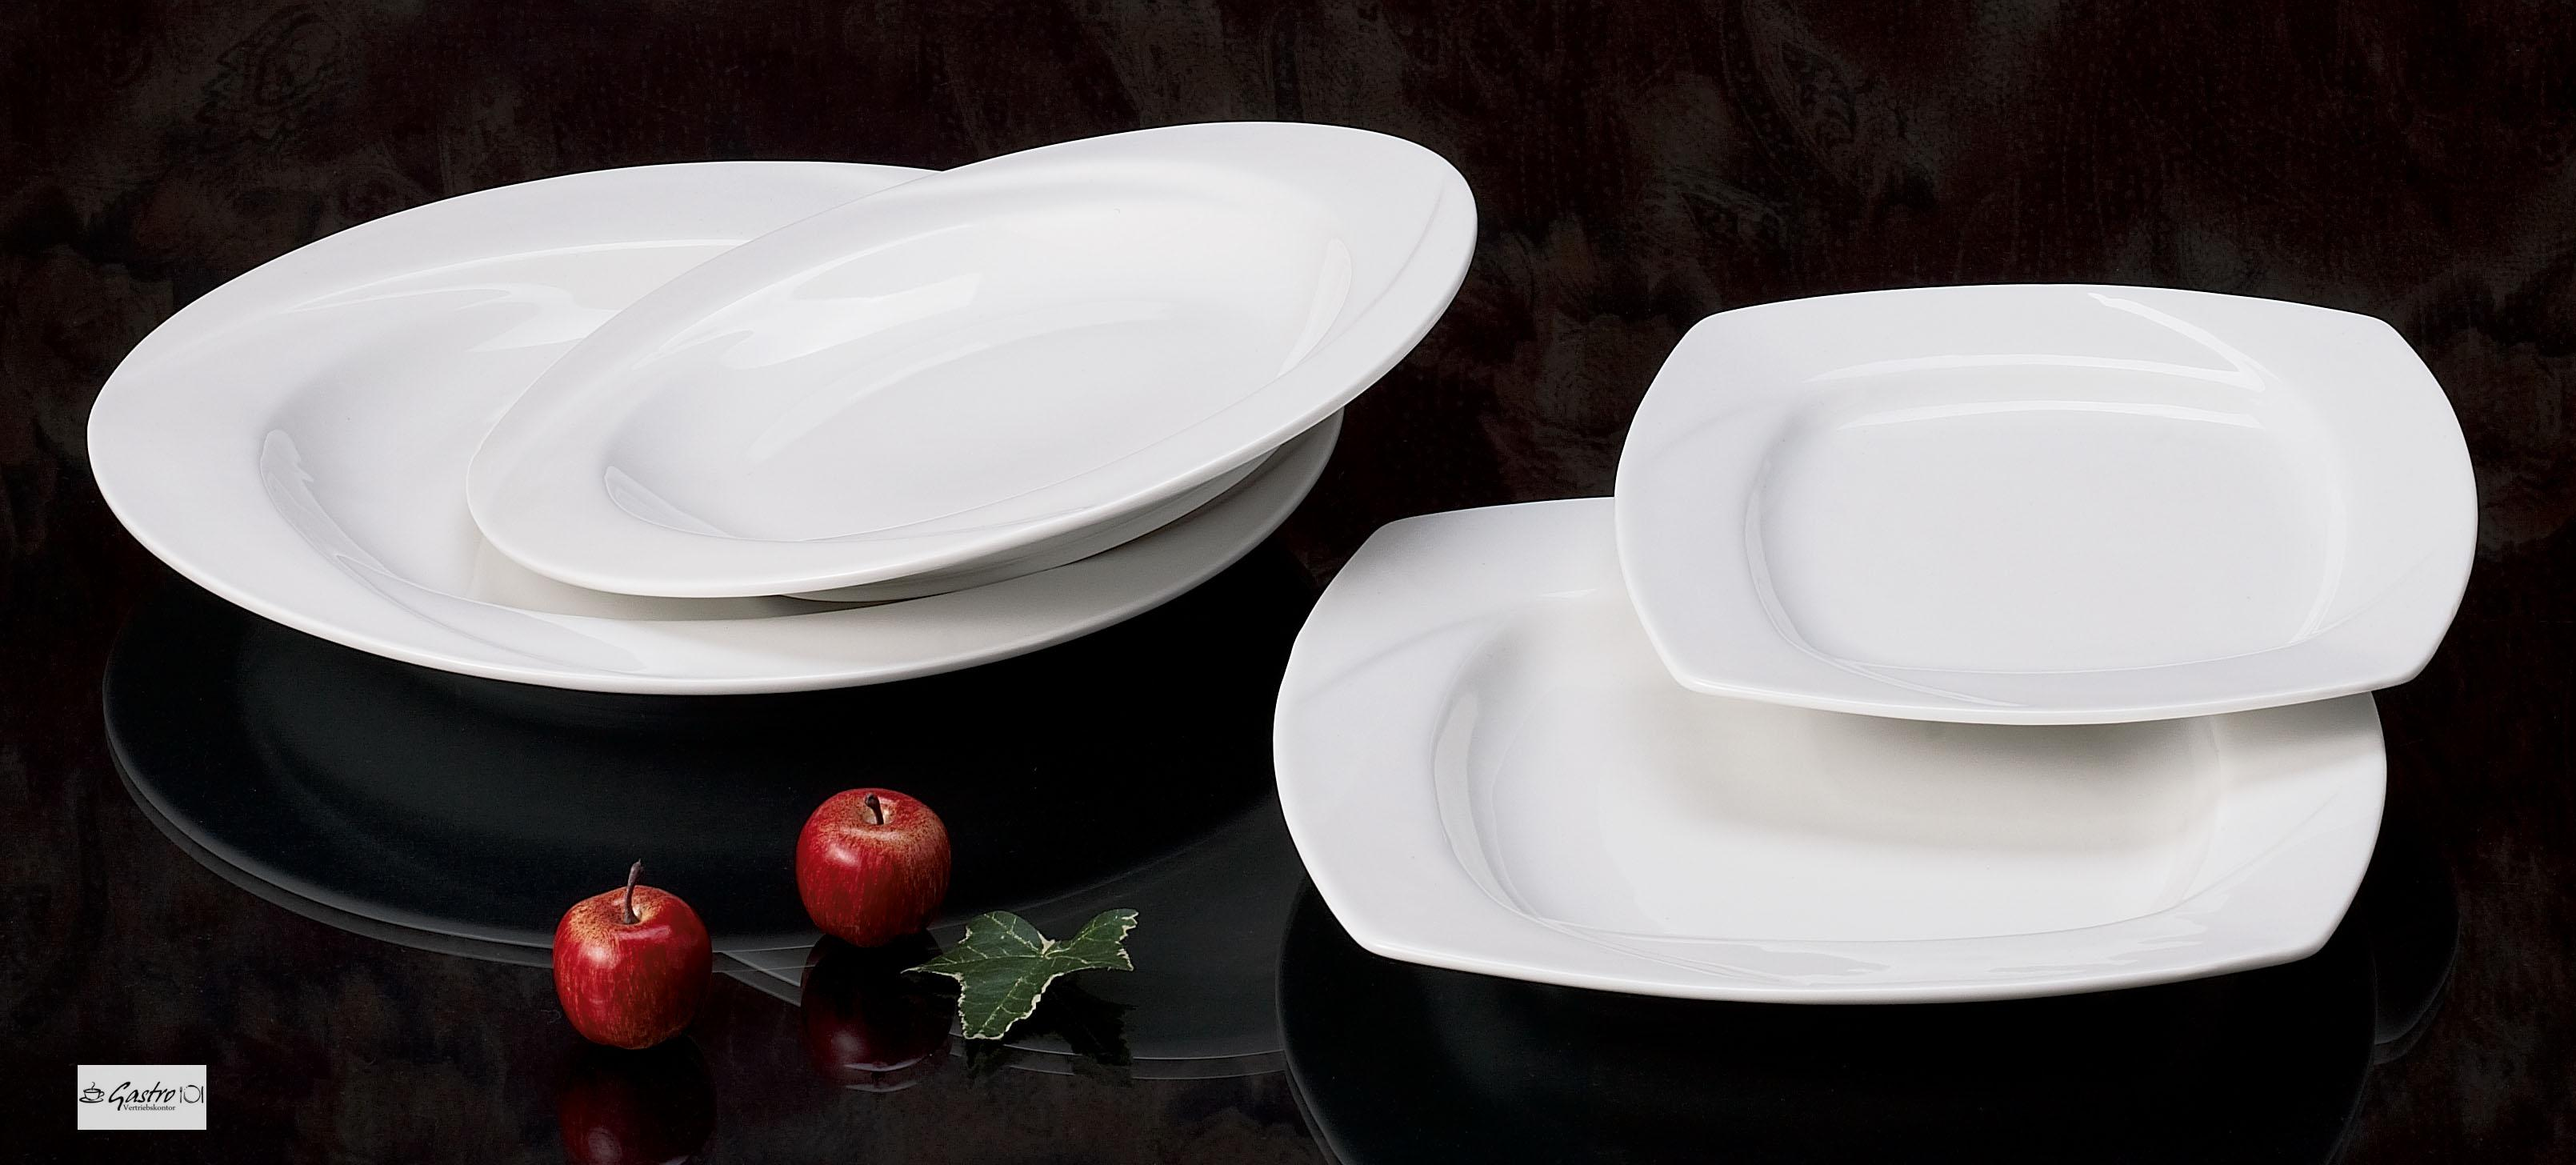 12 design porzellan speise pasta teller tief 30cm eckig ebay. Black Bedroom Furniture Sets. Home Design Ideas